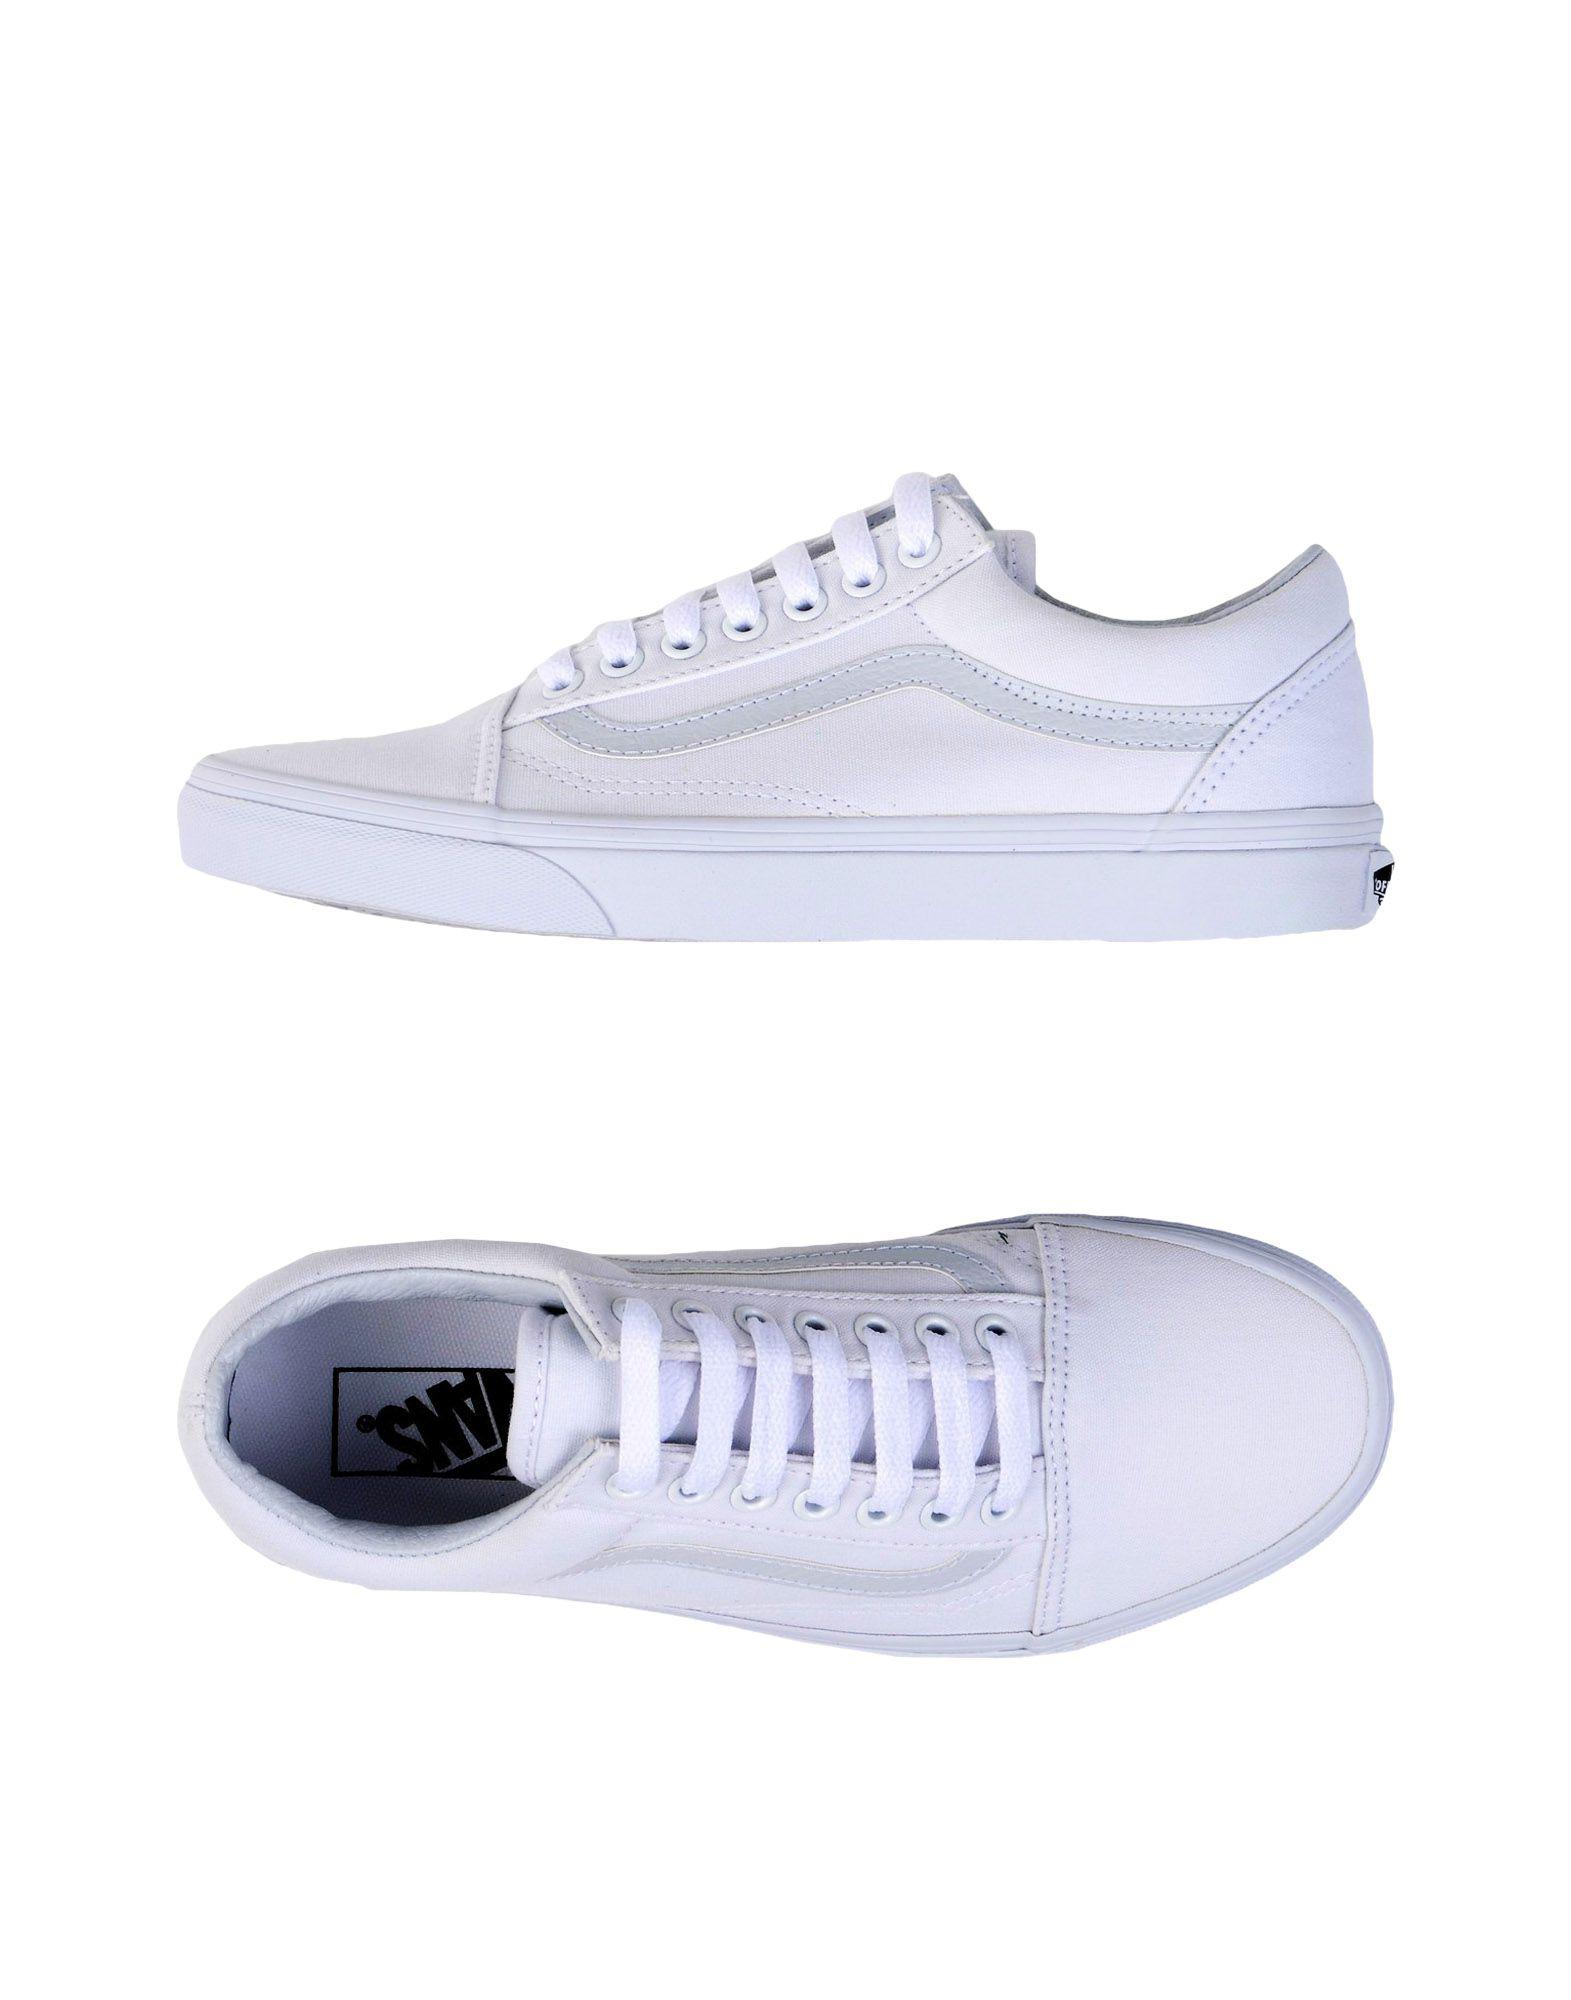 VANS Damen Low Sneakers & Tennisschuhe Farbe Weiß Größe 7 jetztbilligerkaufen